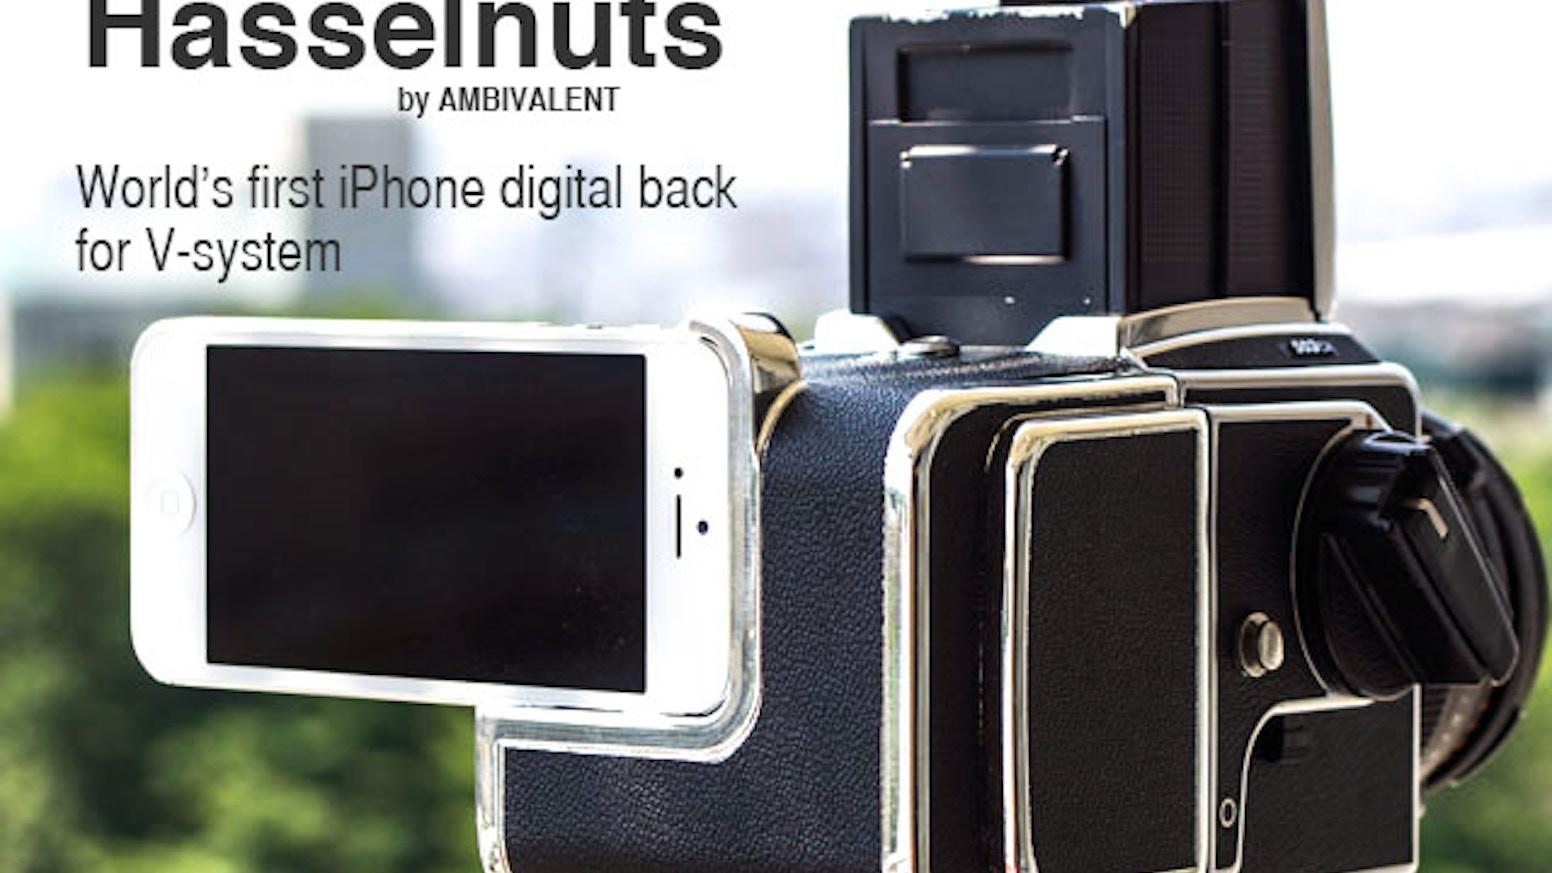 Hasselnuts: Hasselblad Camera + iPhone DigitalBack Kit! by